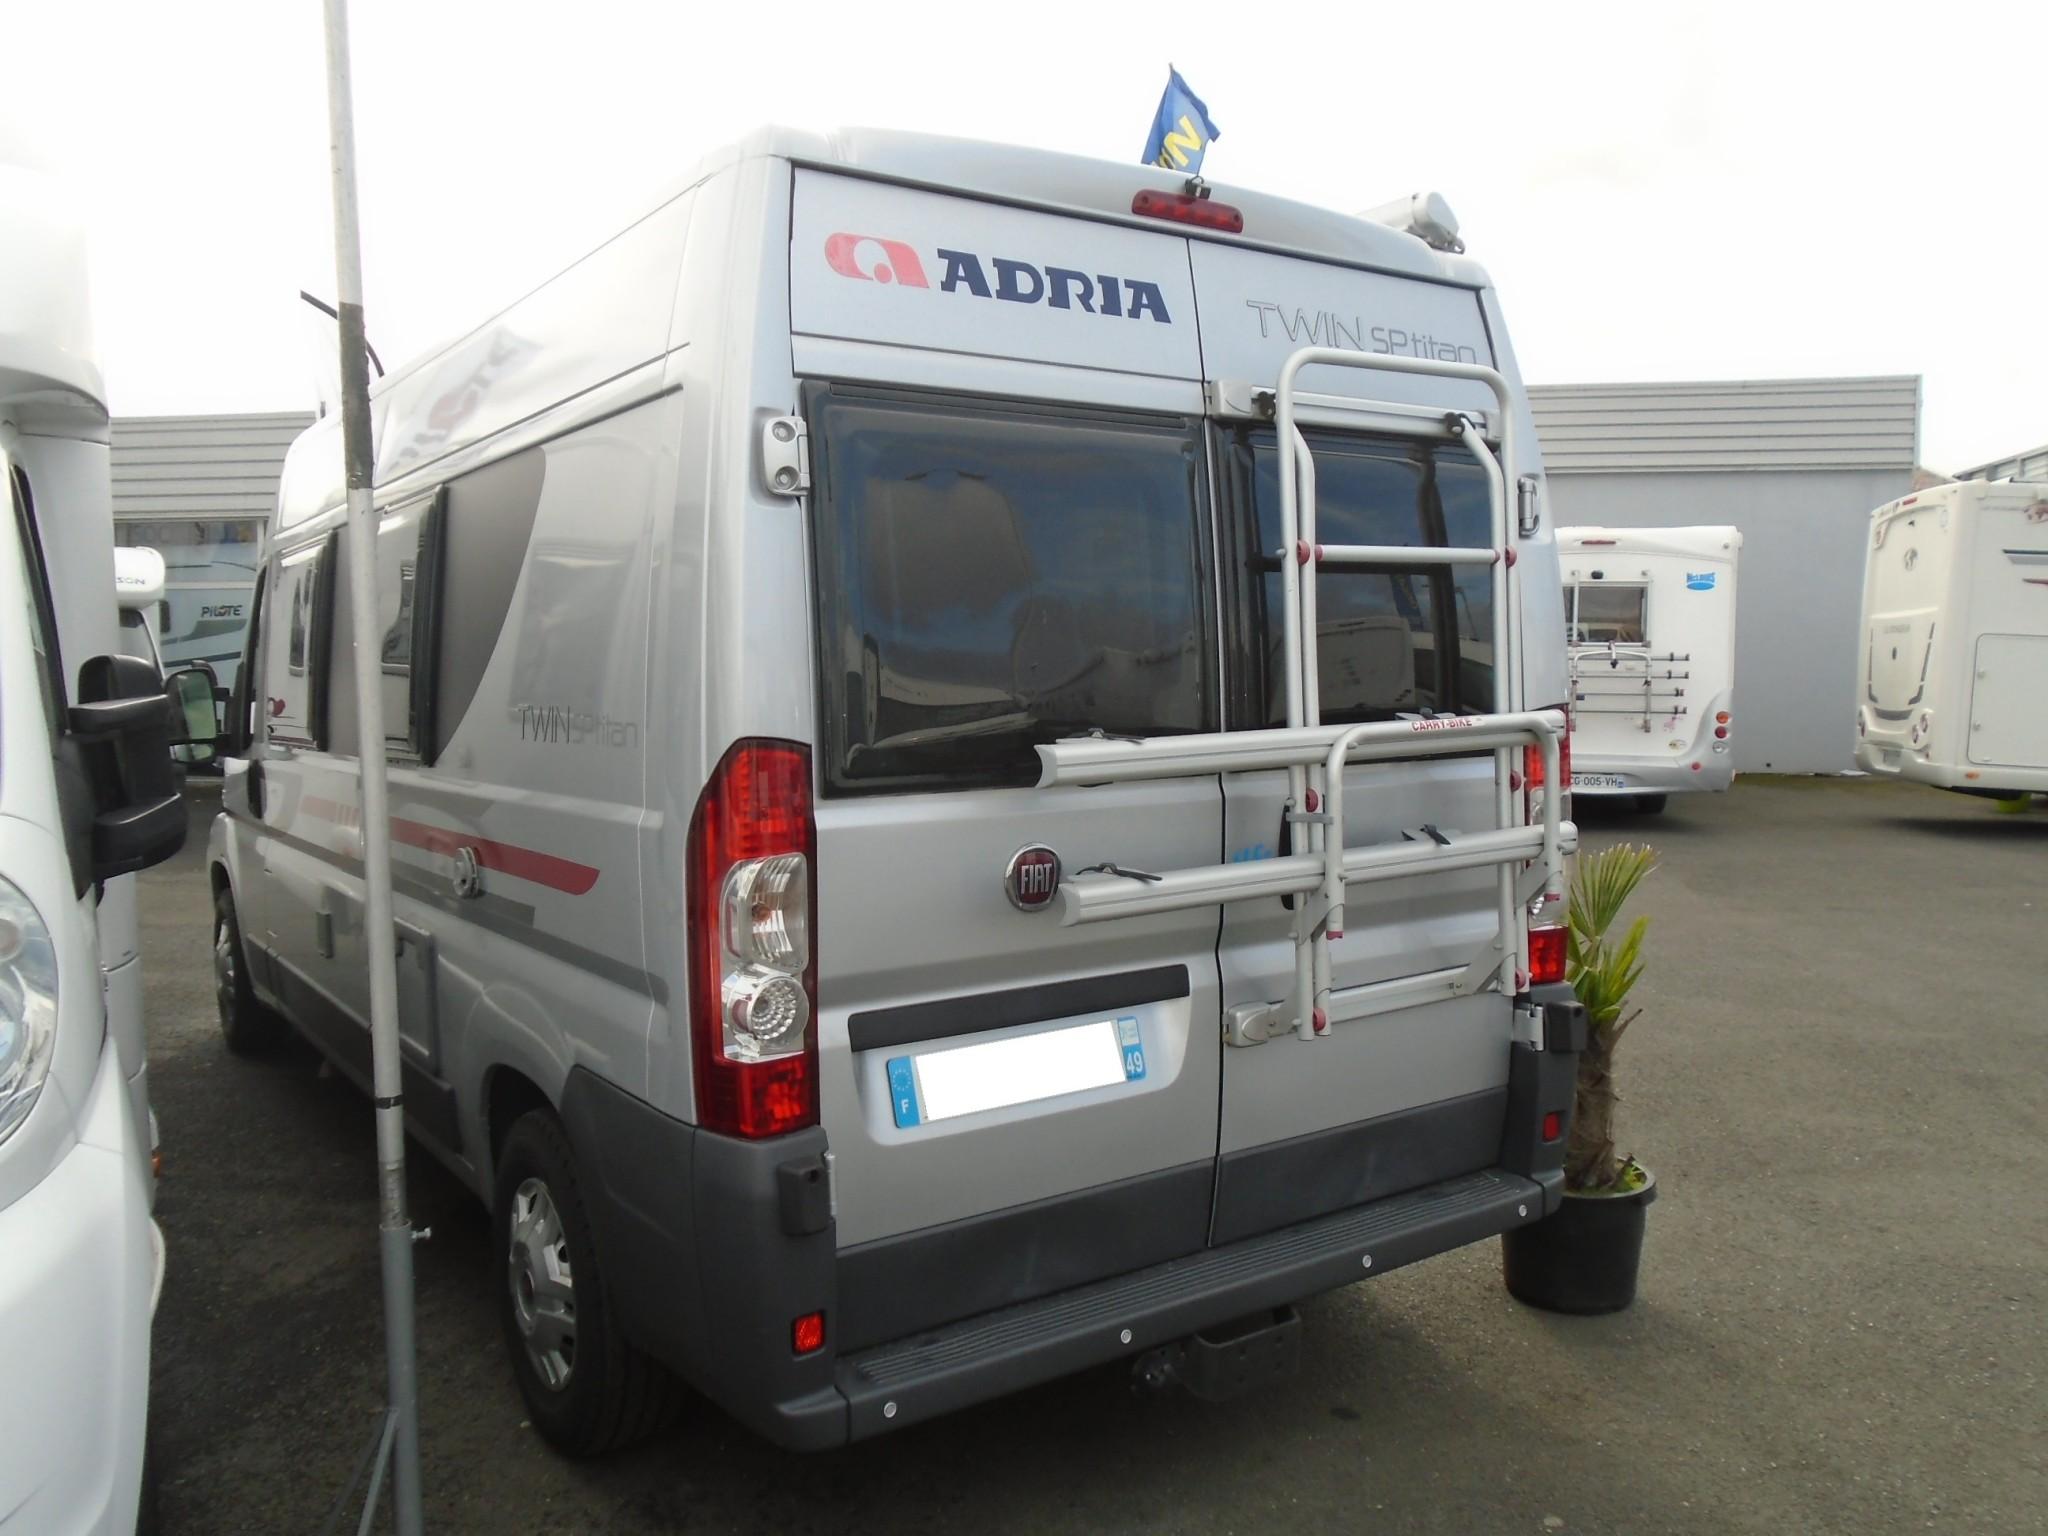 Adria Twin SP Titan - 2